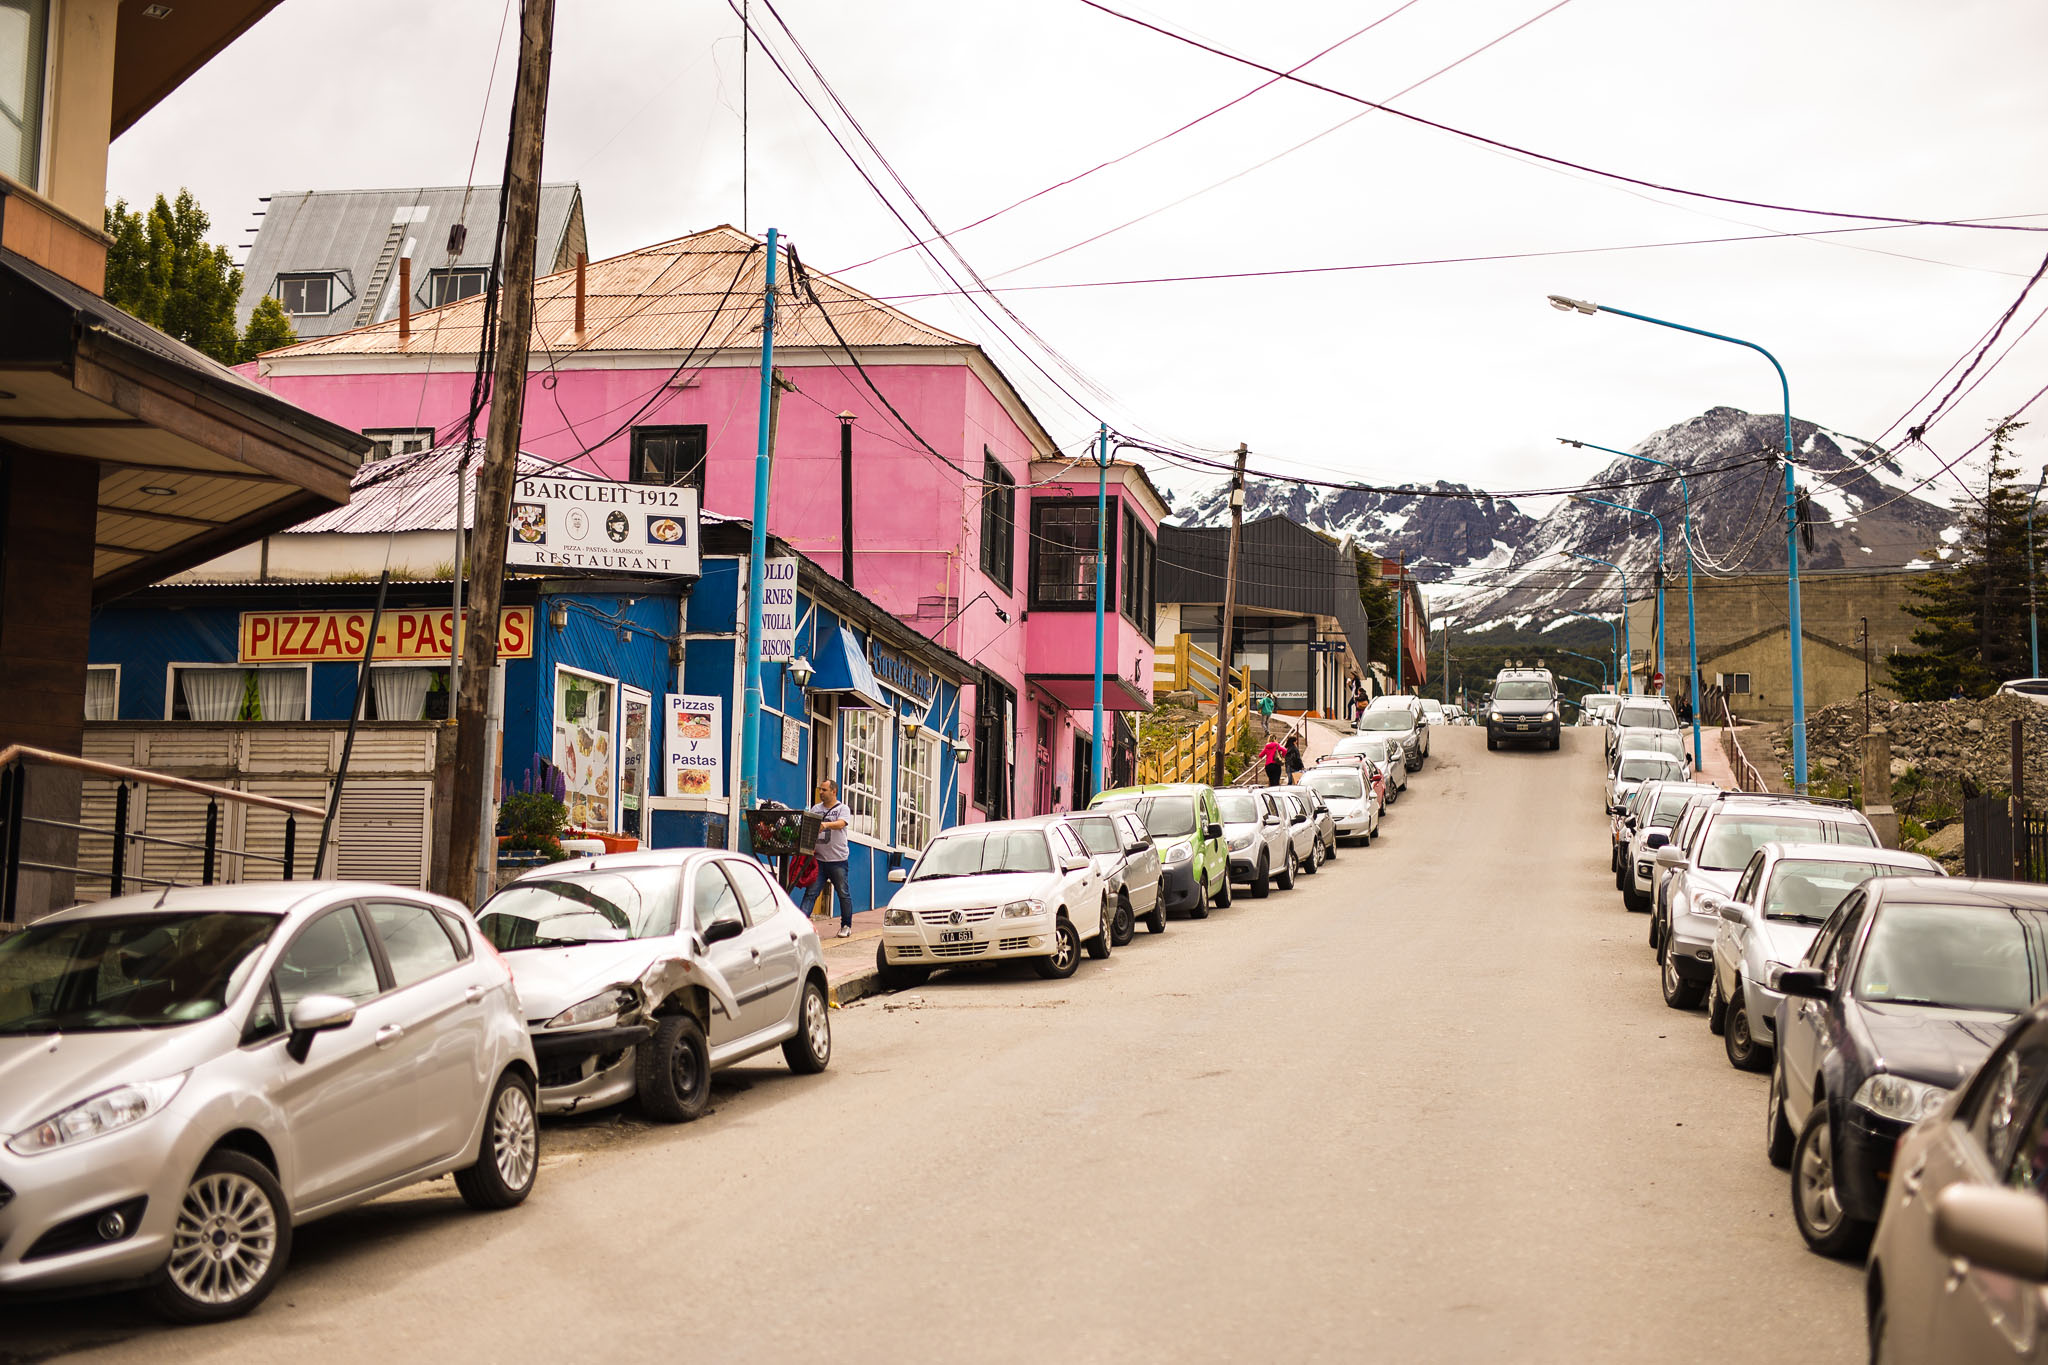 Wedding-travellers-ushuaia-argentina-fin-del-mundo-city-street